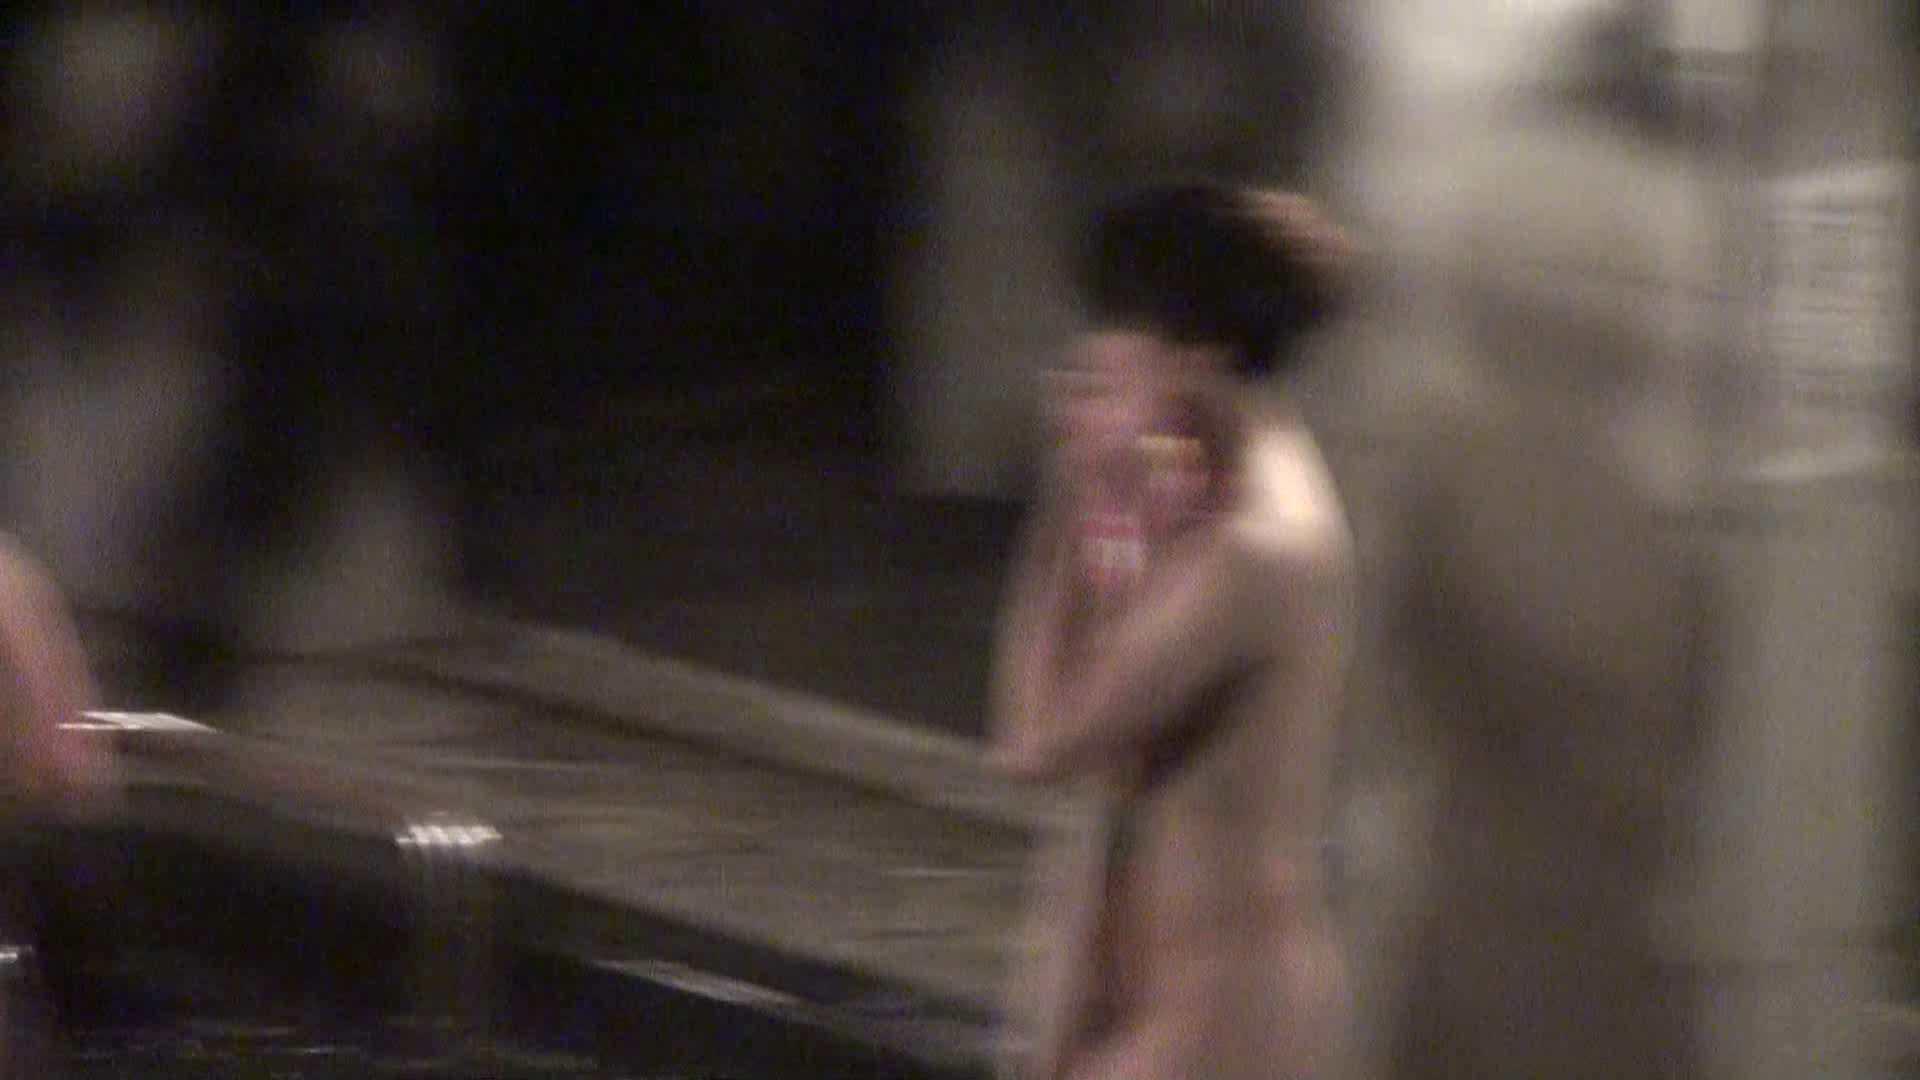 Aquaな露天風呂Vol.374 露天風呂突入 オメコ無修正動画無料 86pic 2